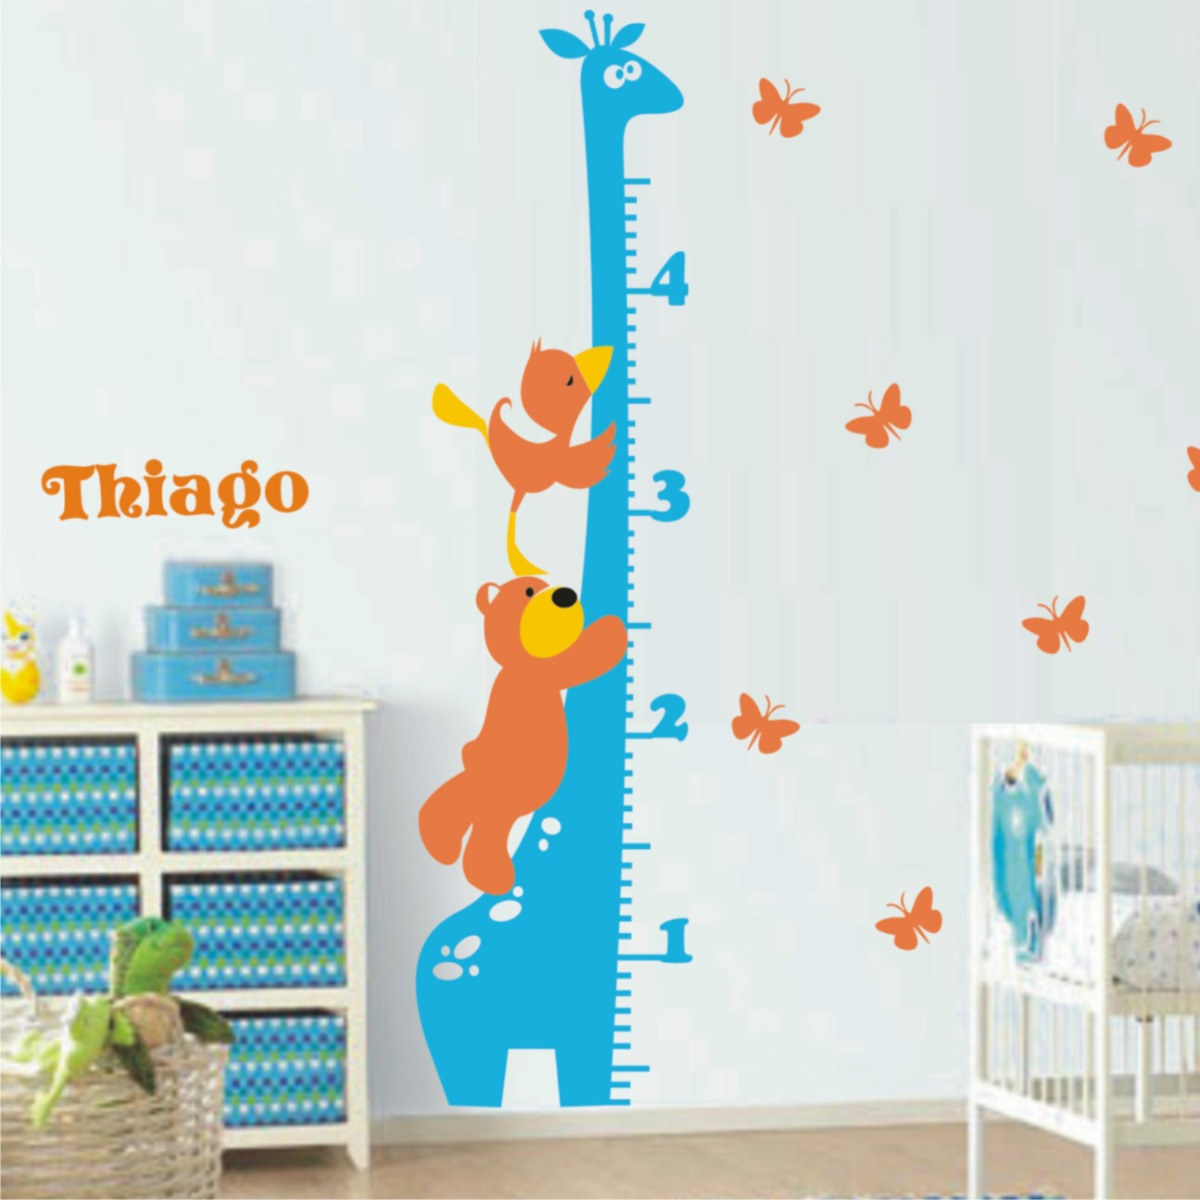 Adesivos de parede decorativo rvores papel parede for Papel pared infantil